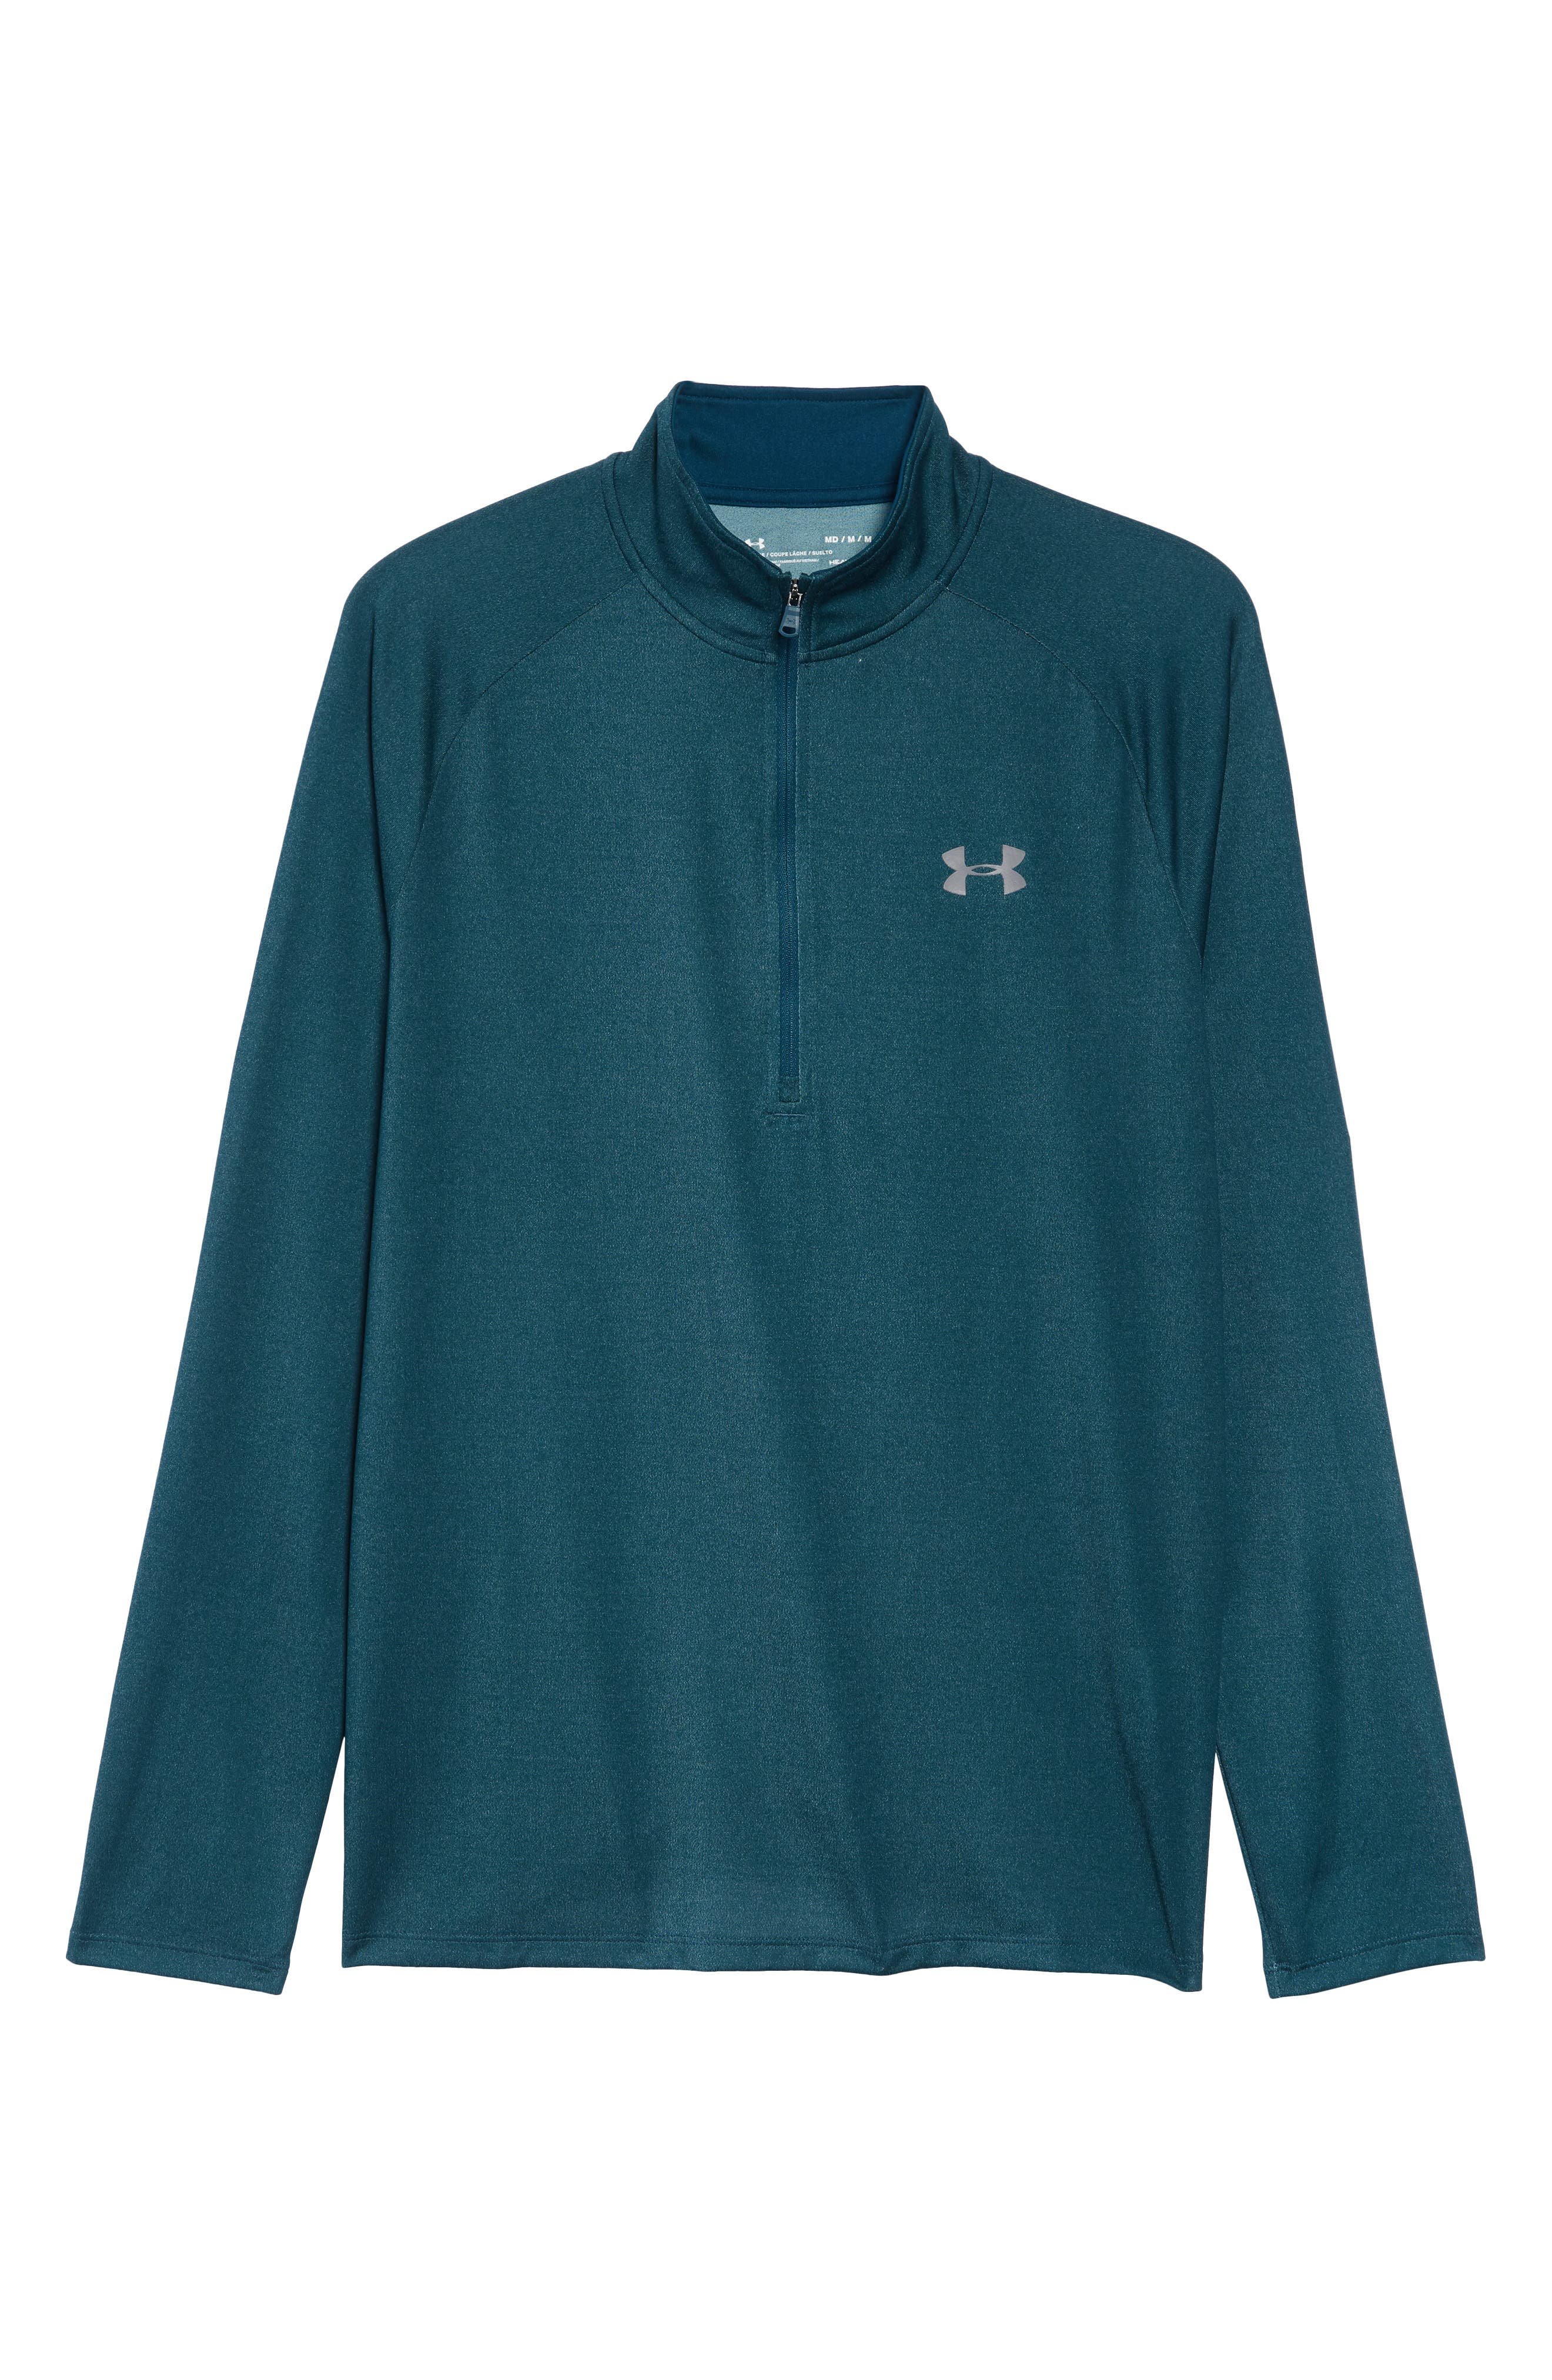 Tech Half Zip Sweatshirt,                             Alternate thumbnail 6, color,                             TEAL